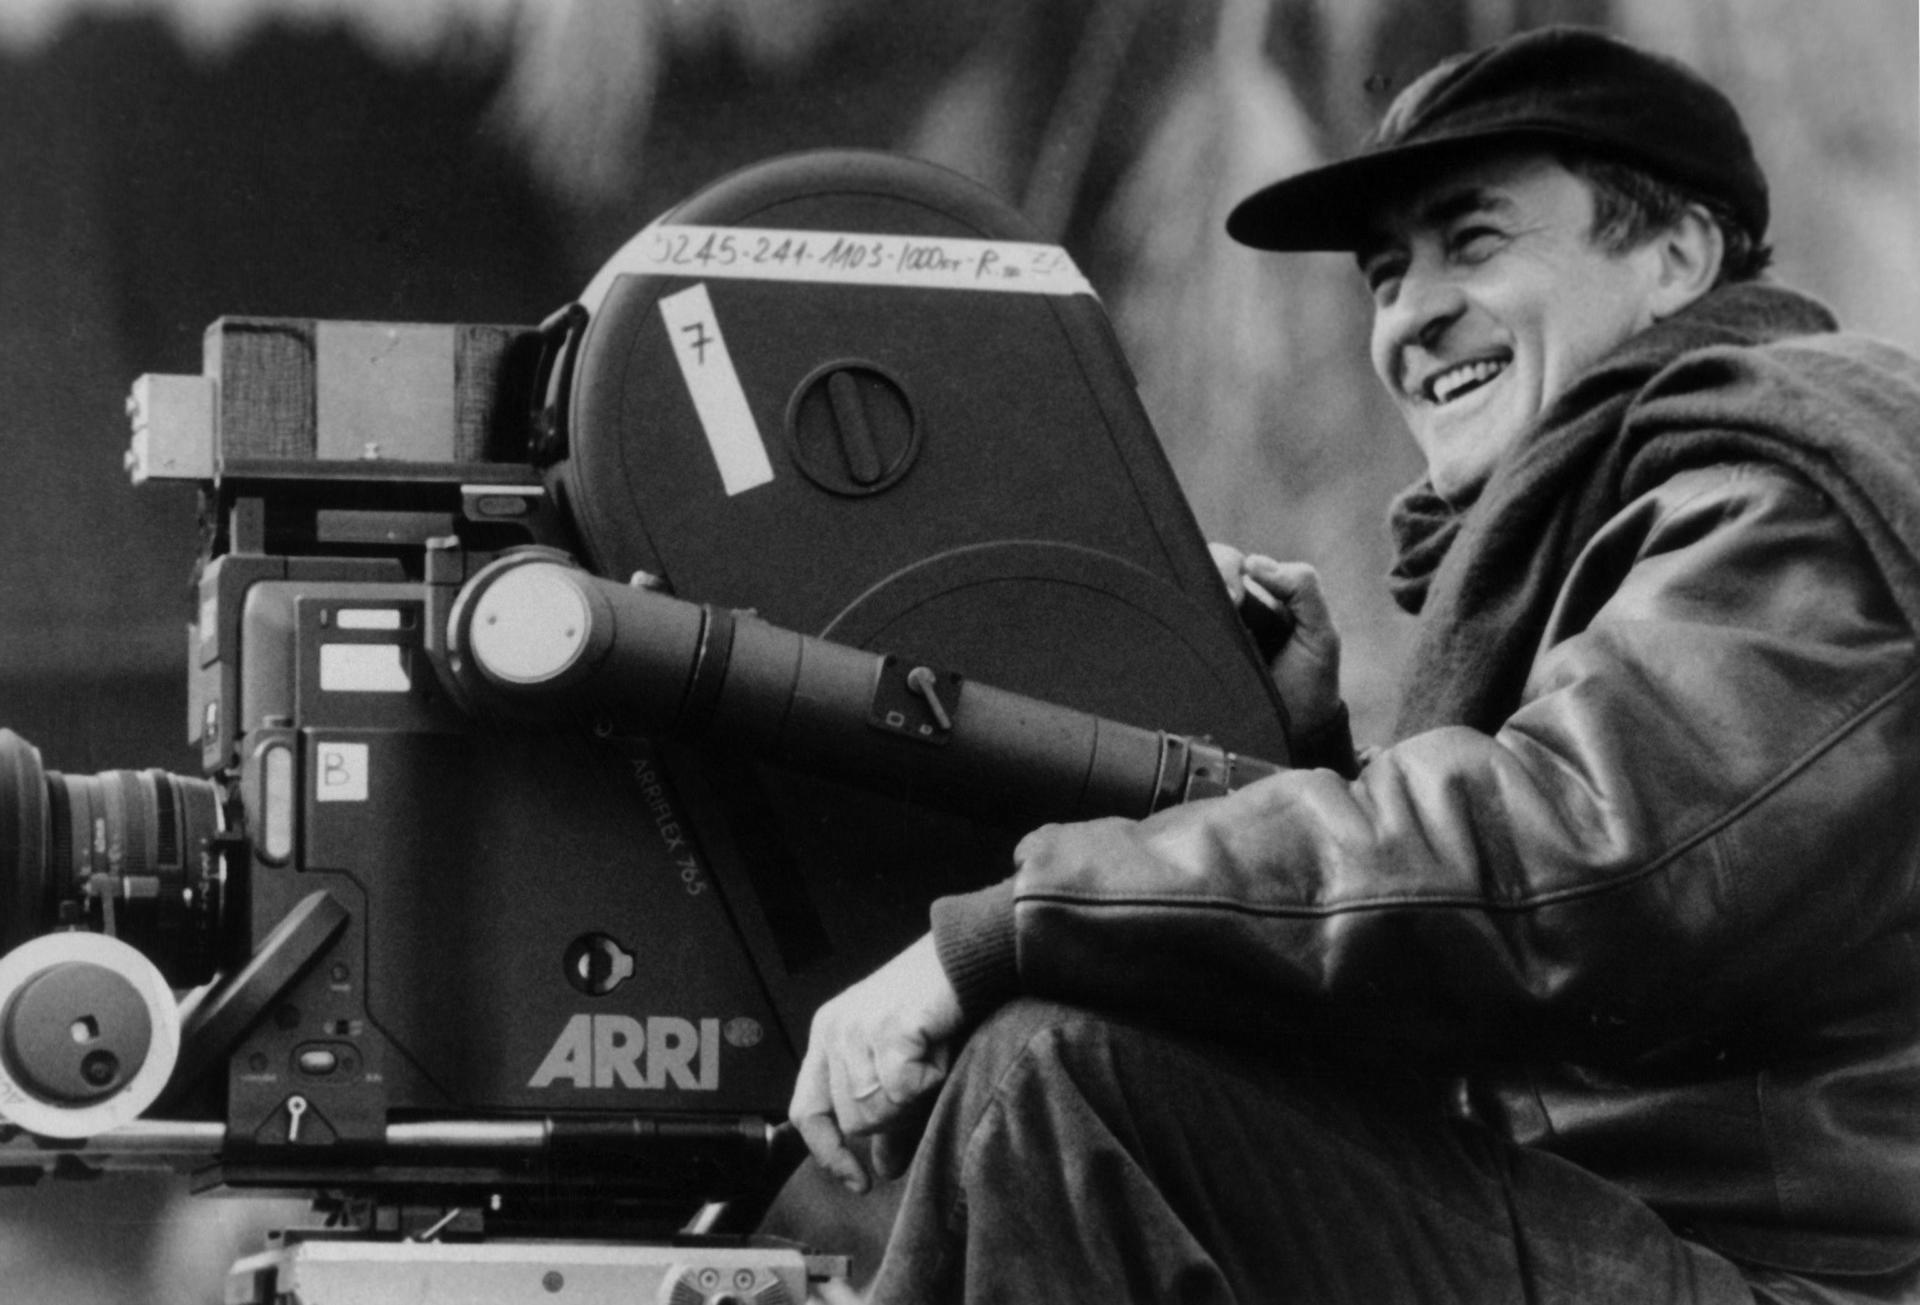 Fallece el director de cine, Bernardo Bertolucci